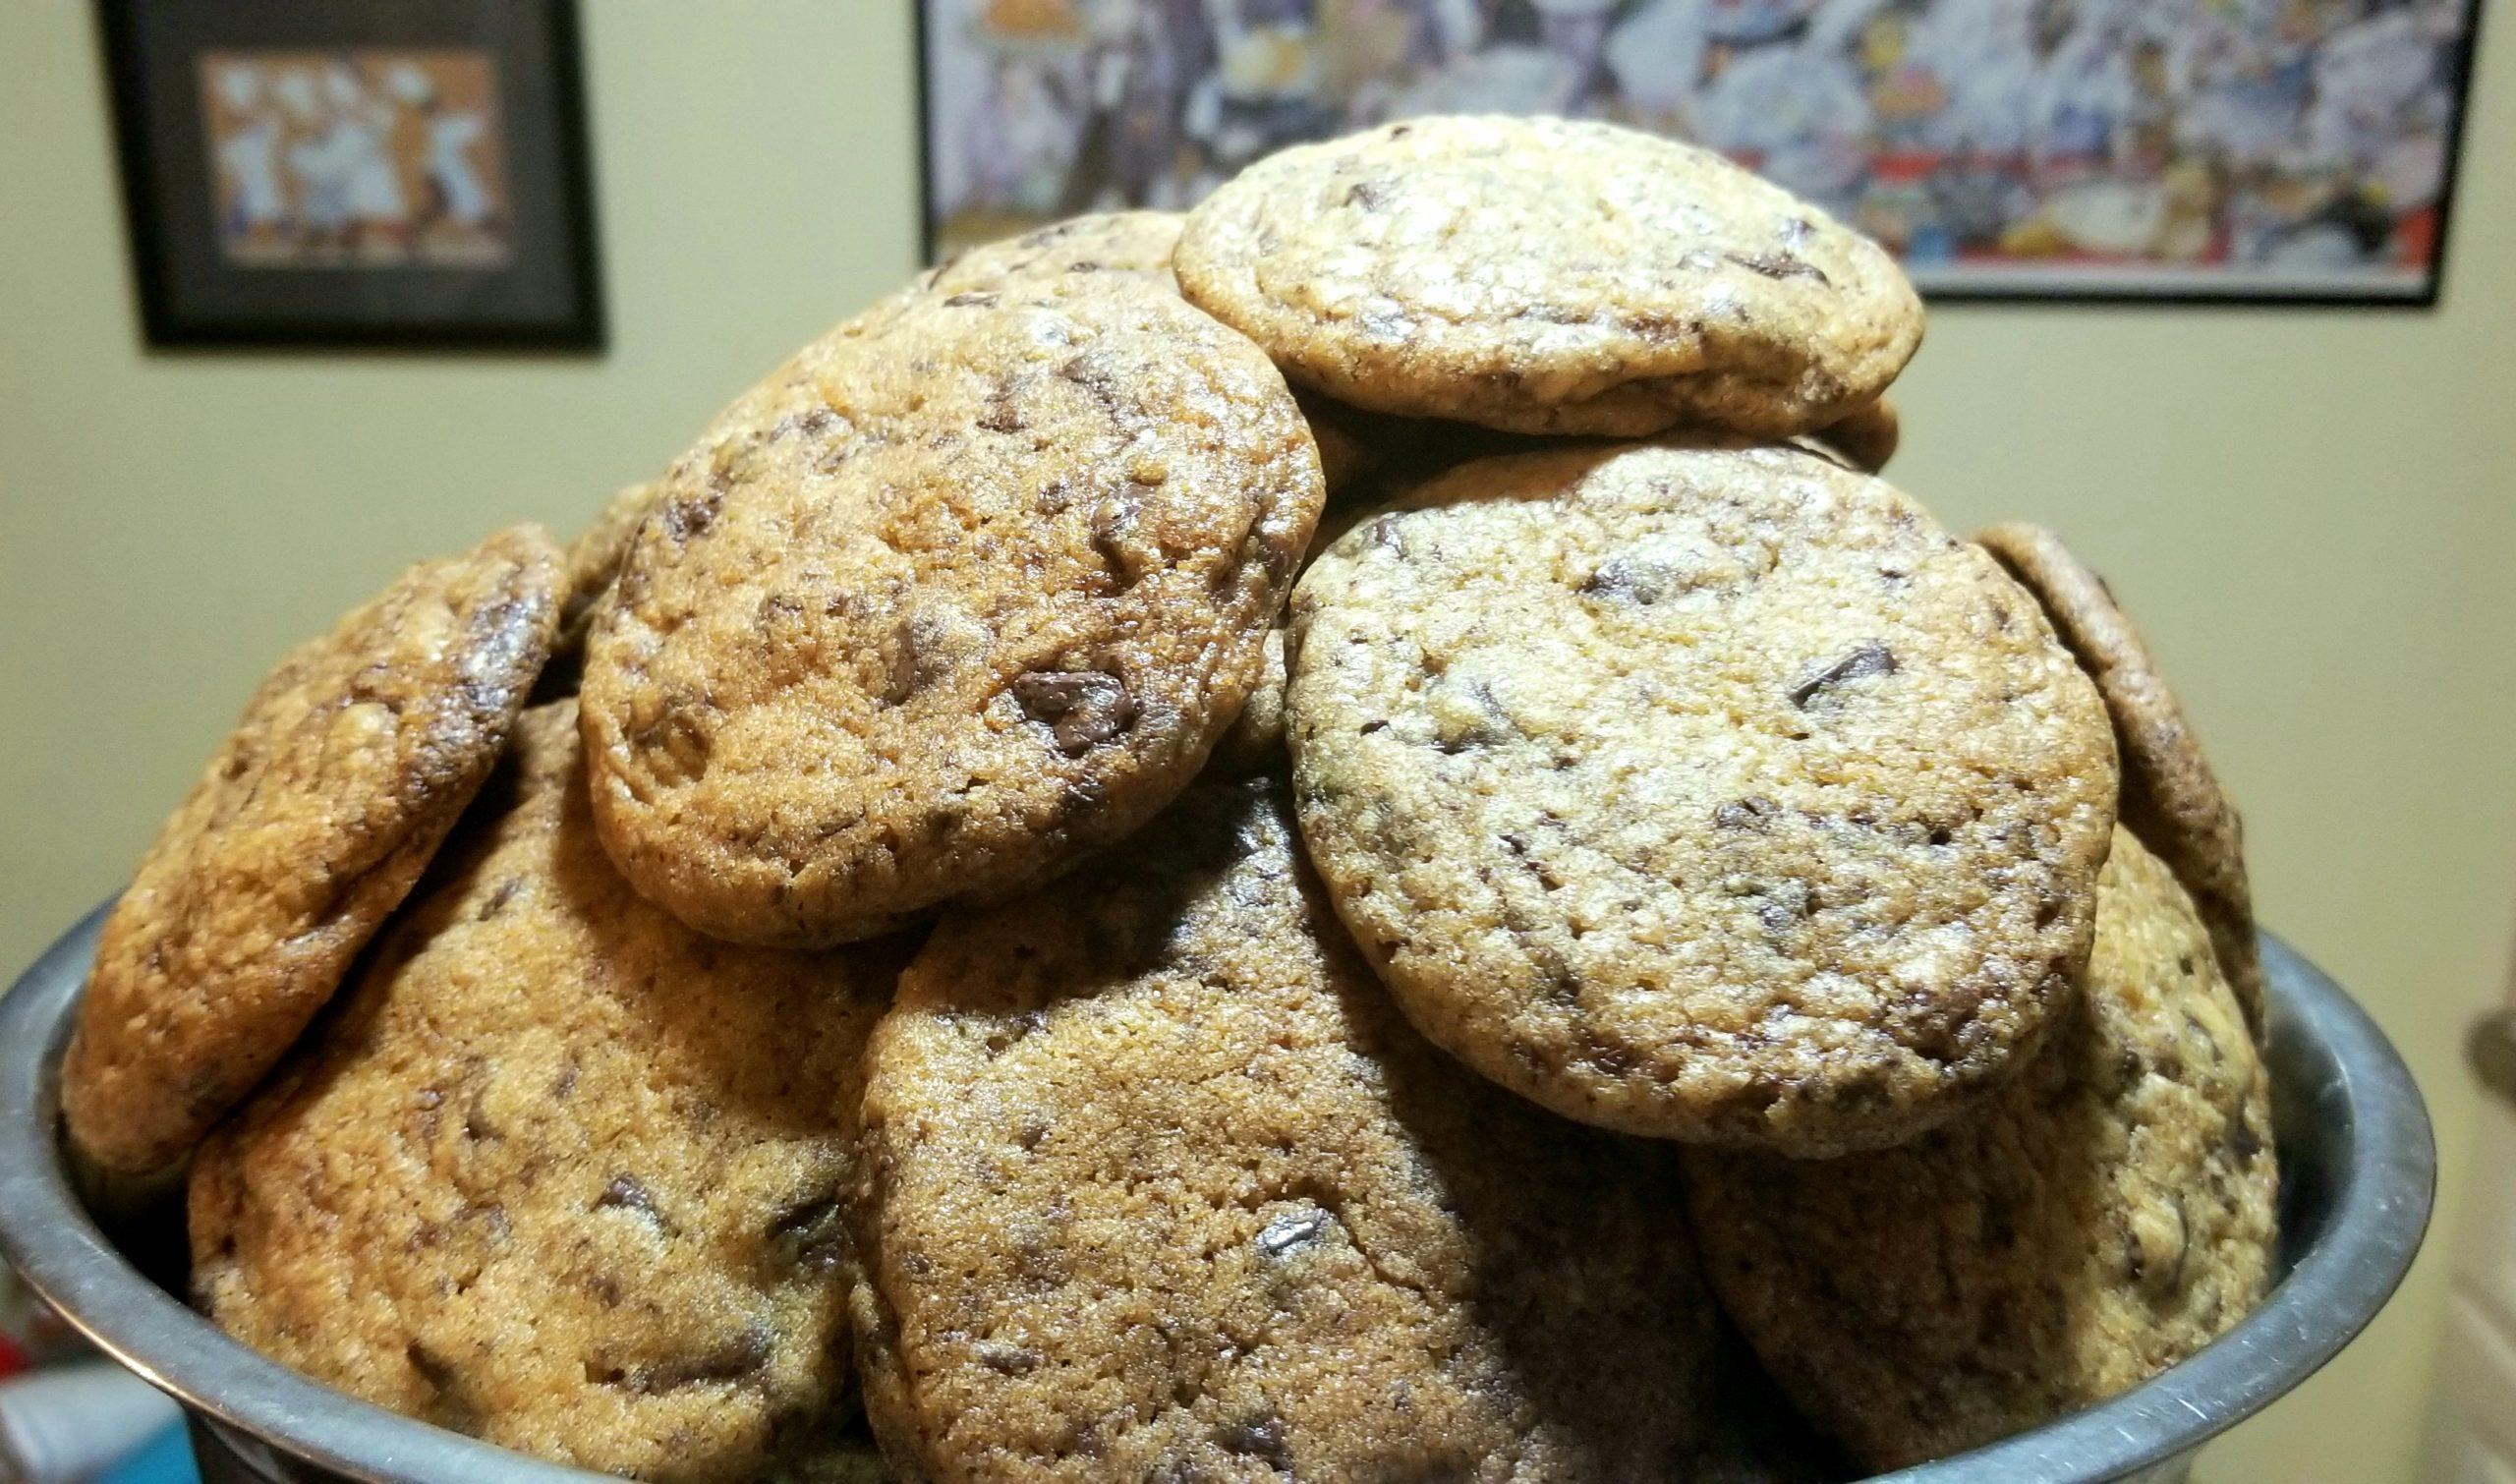 Jessica Craig's chocolate chunk cookies.